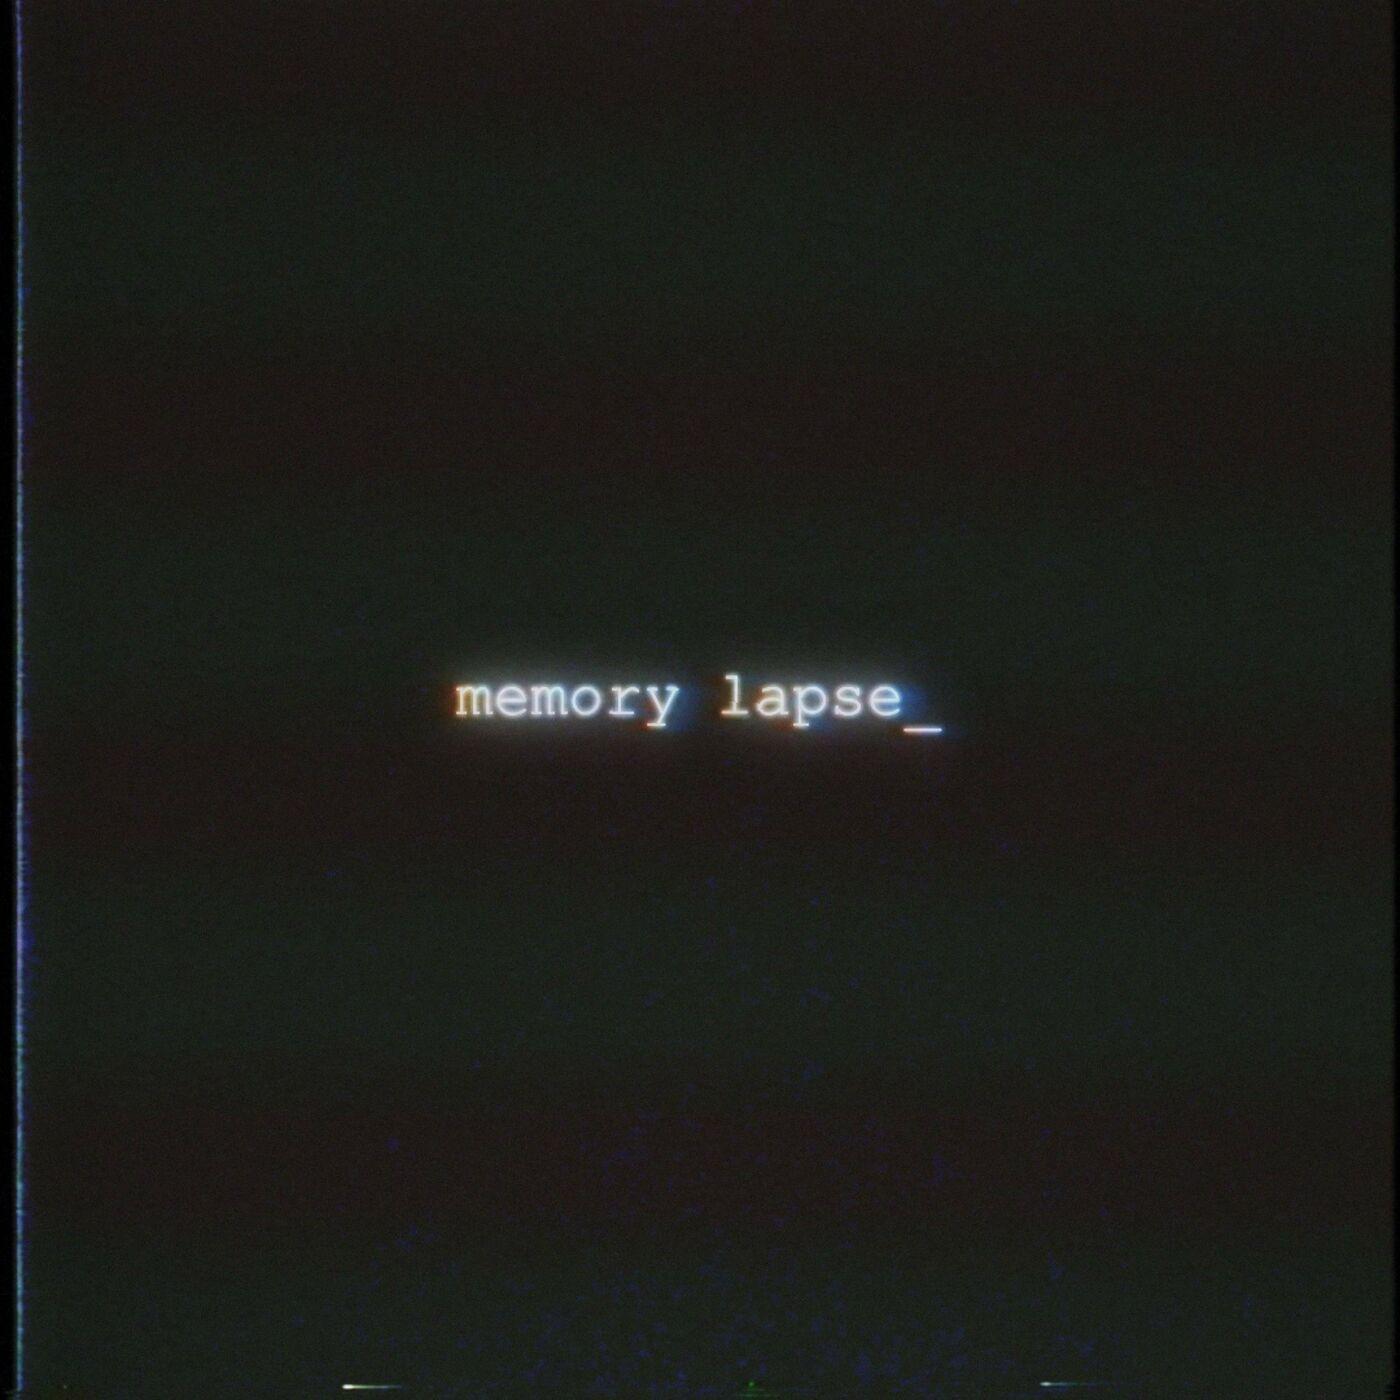 Nubia - Memory Lapse [single] (2020)